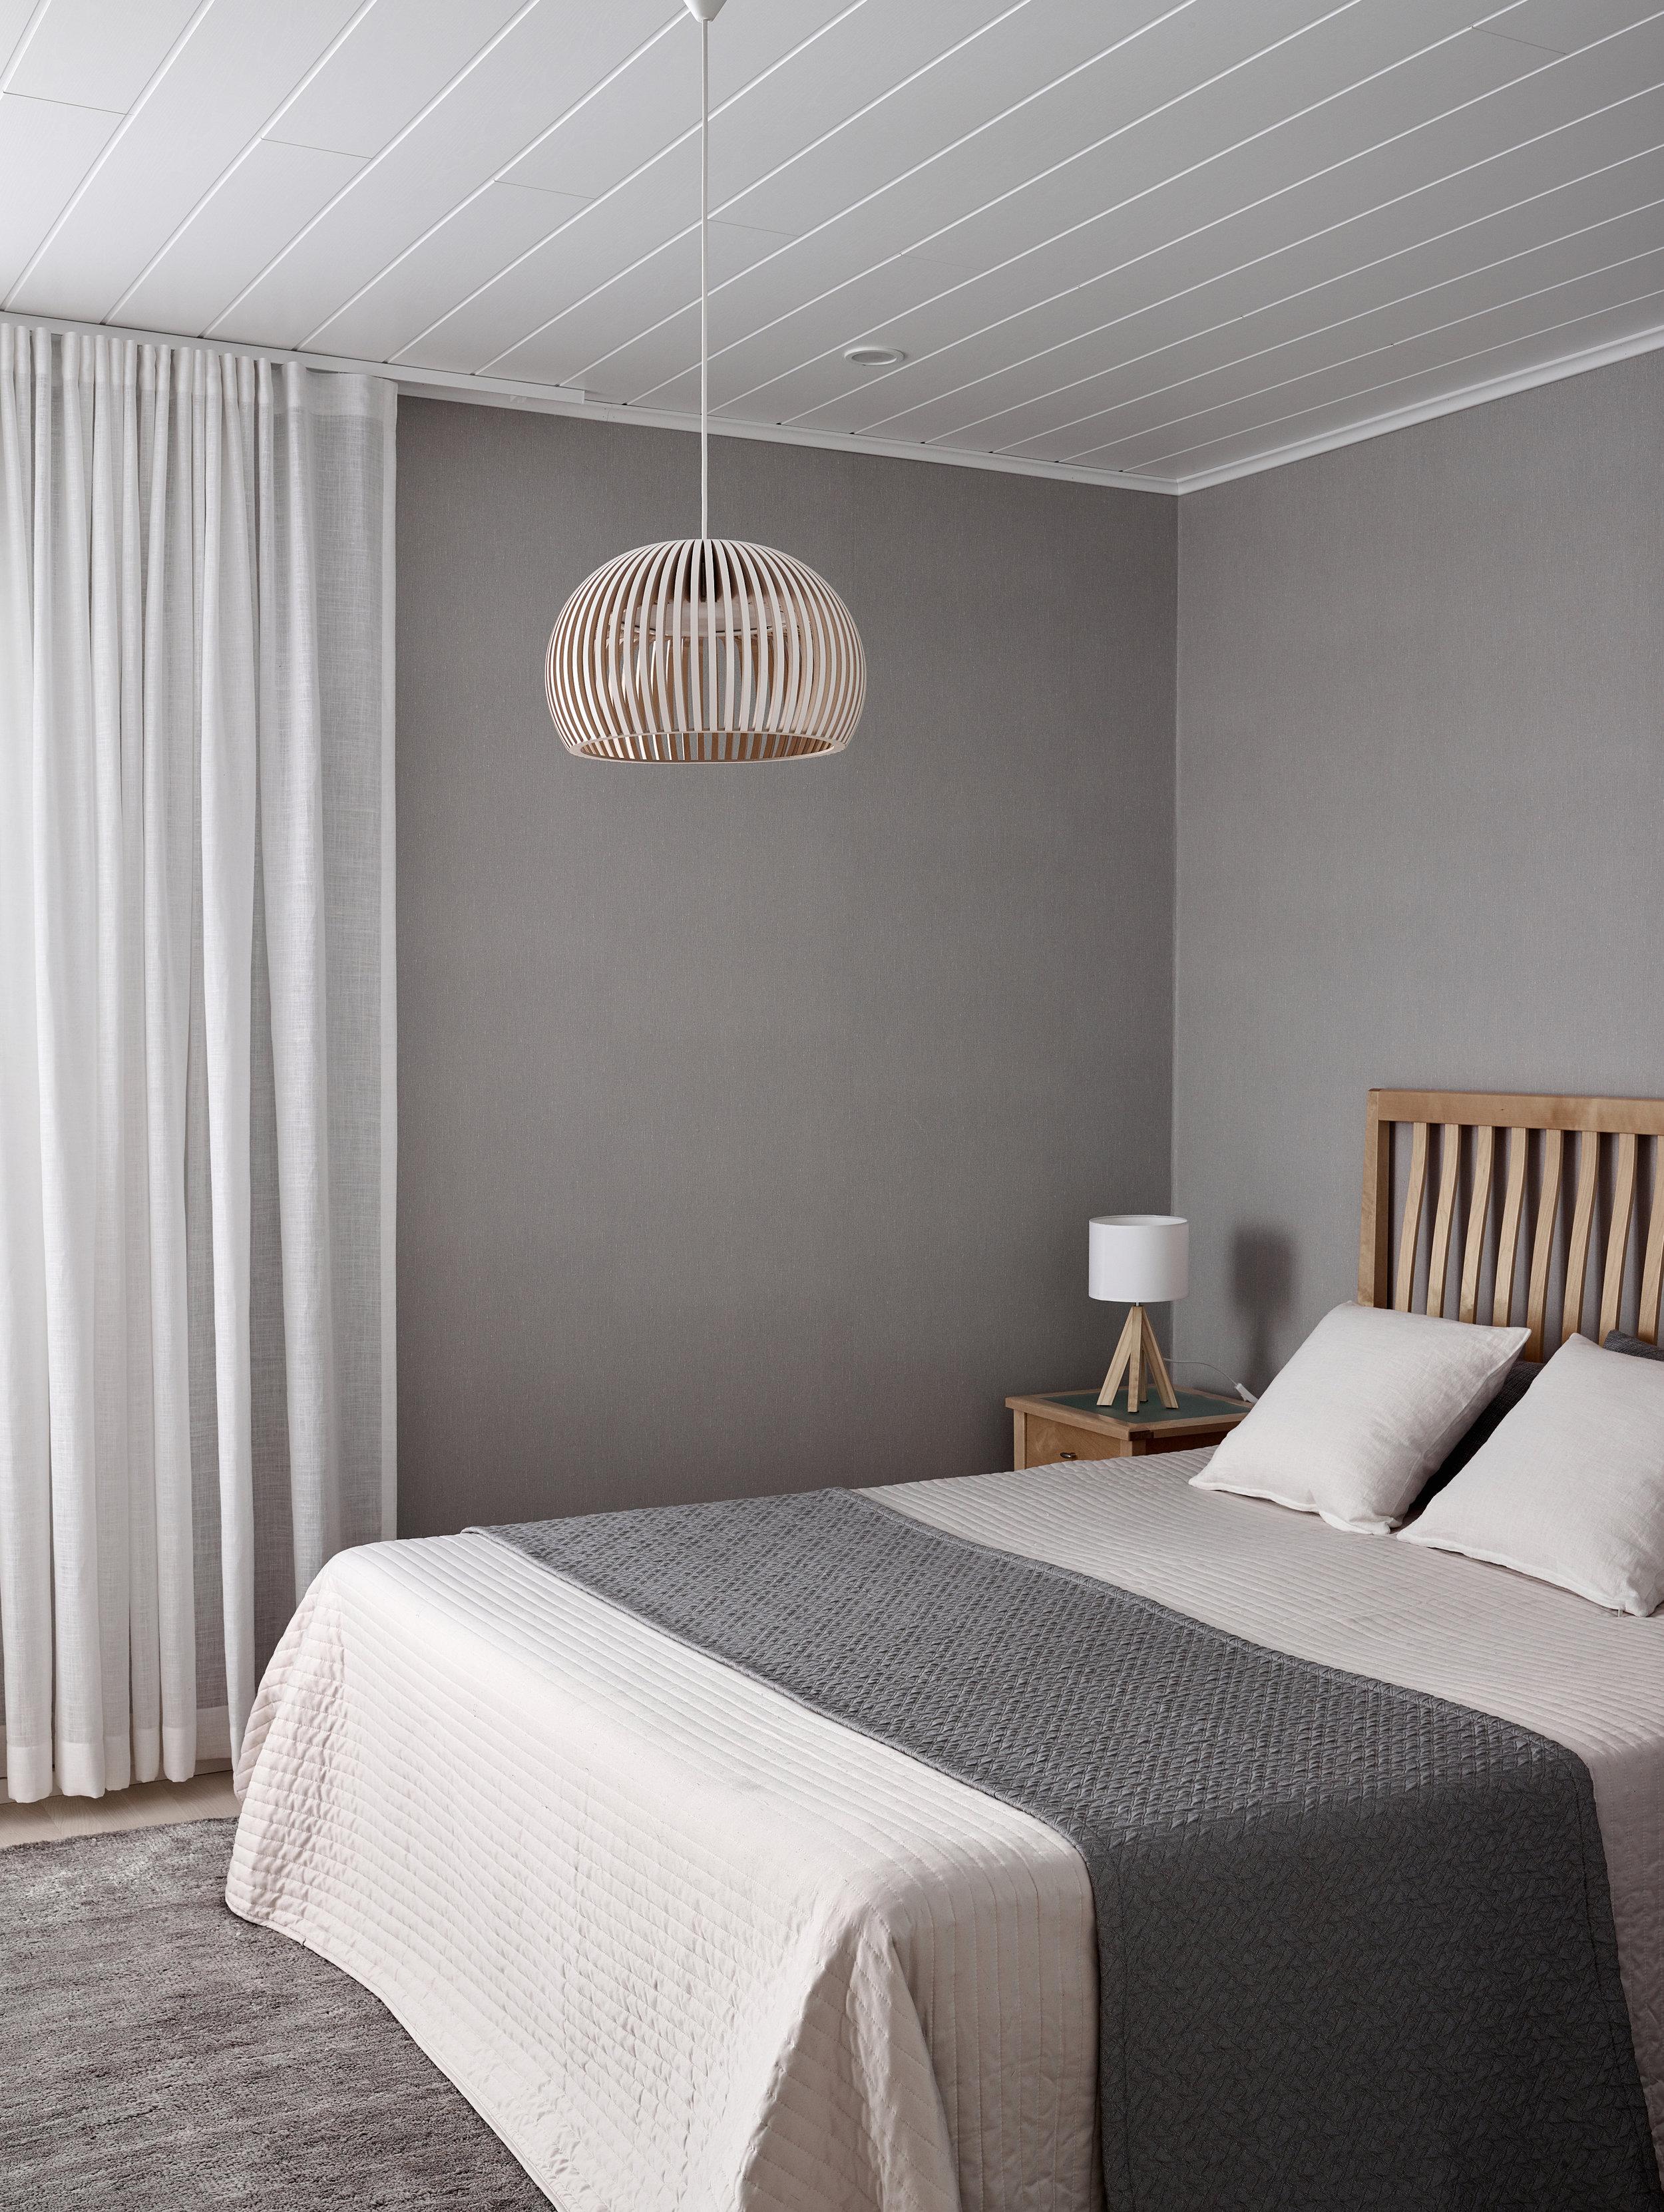 interior-anna-koponen-photo-krista-keltanen-12.jpg